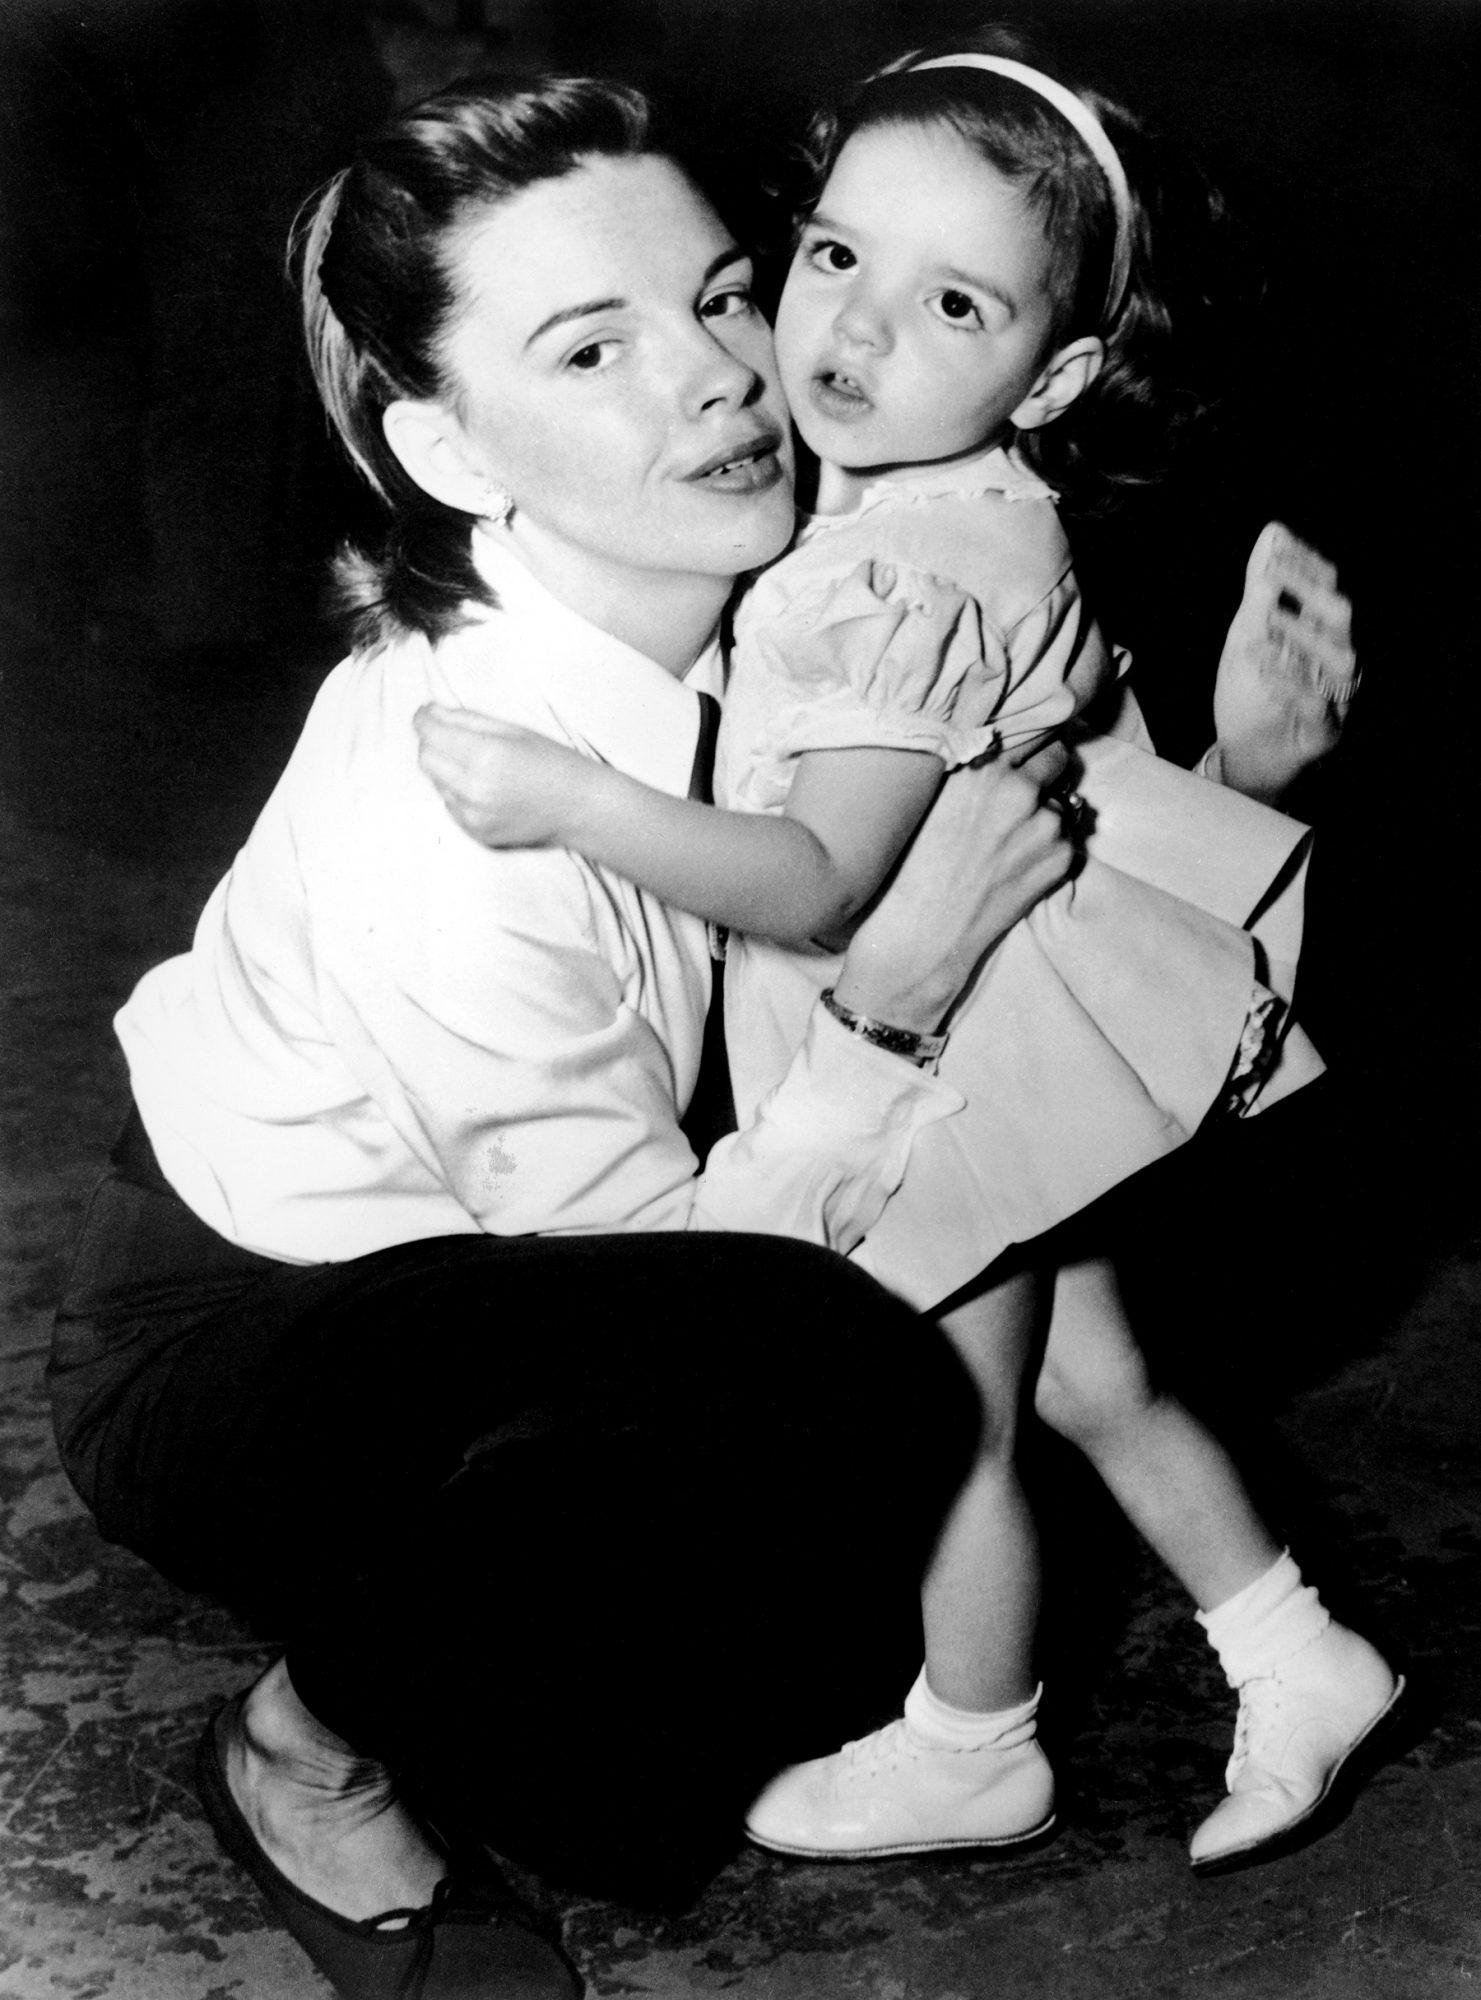 Judy Garland & Young Liza Minnelli On Film Set